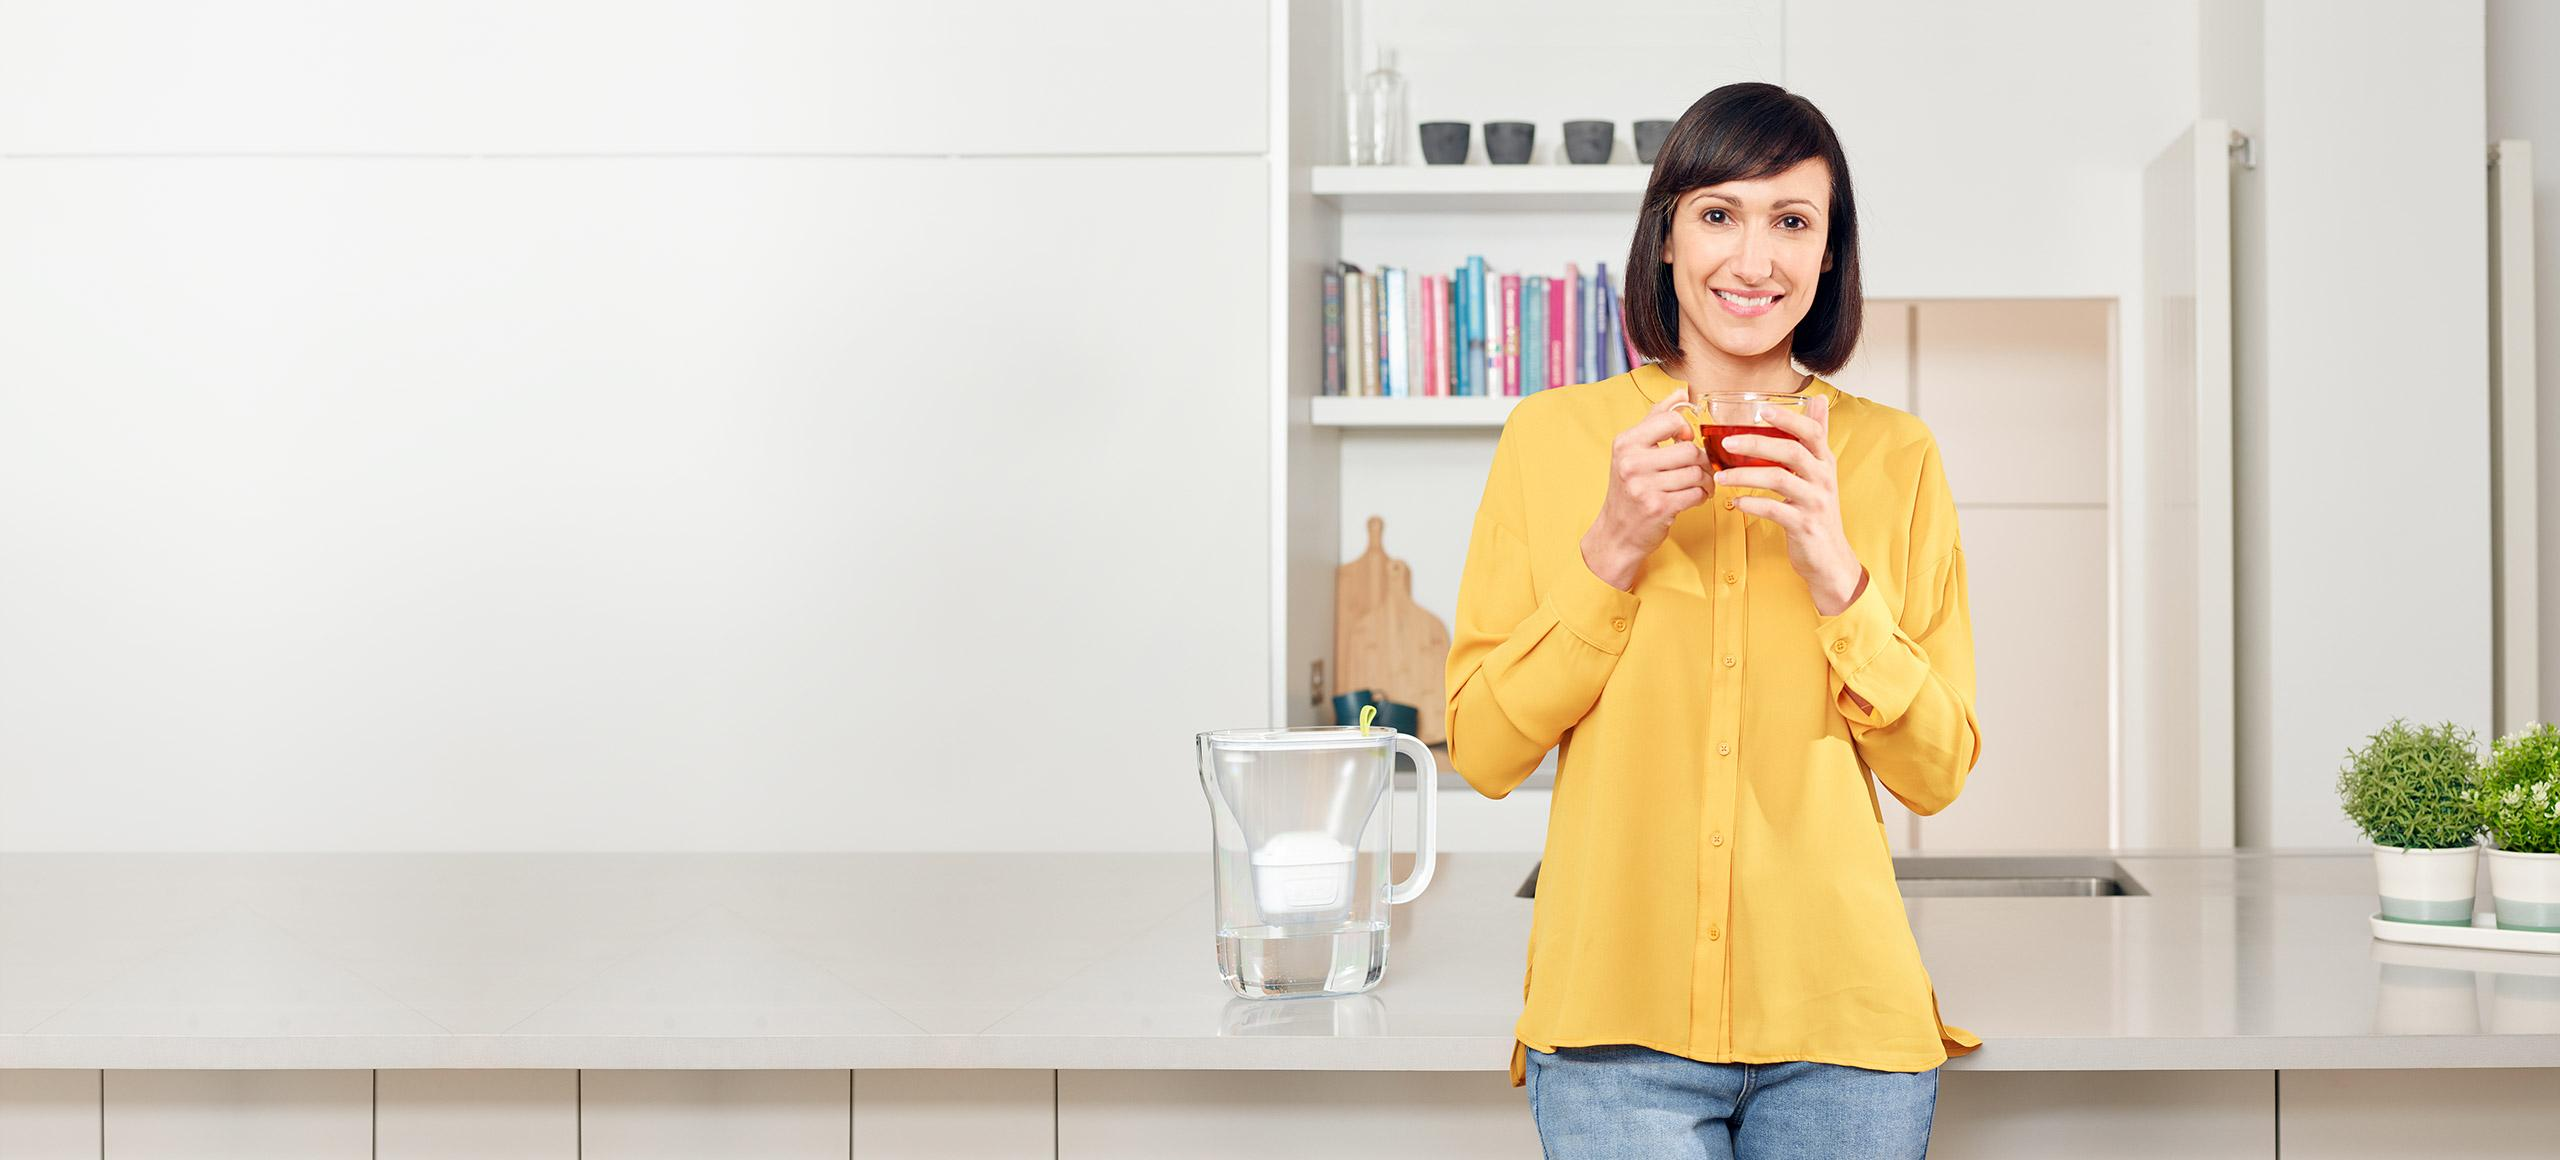 BRITA water filter for better tasting tea